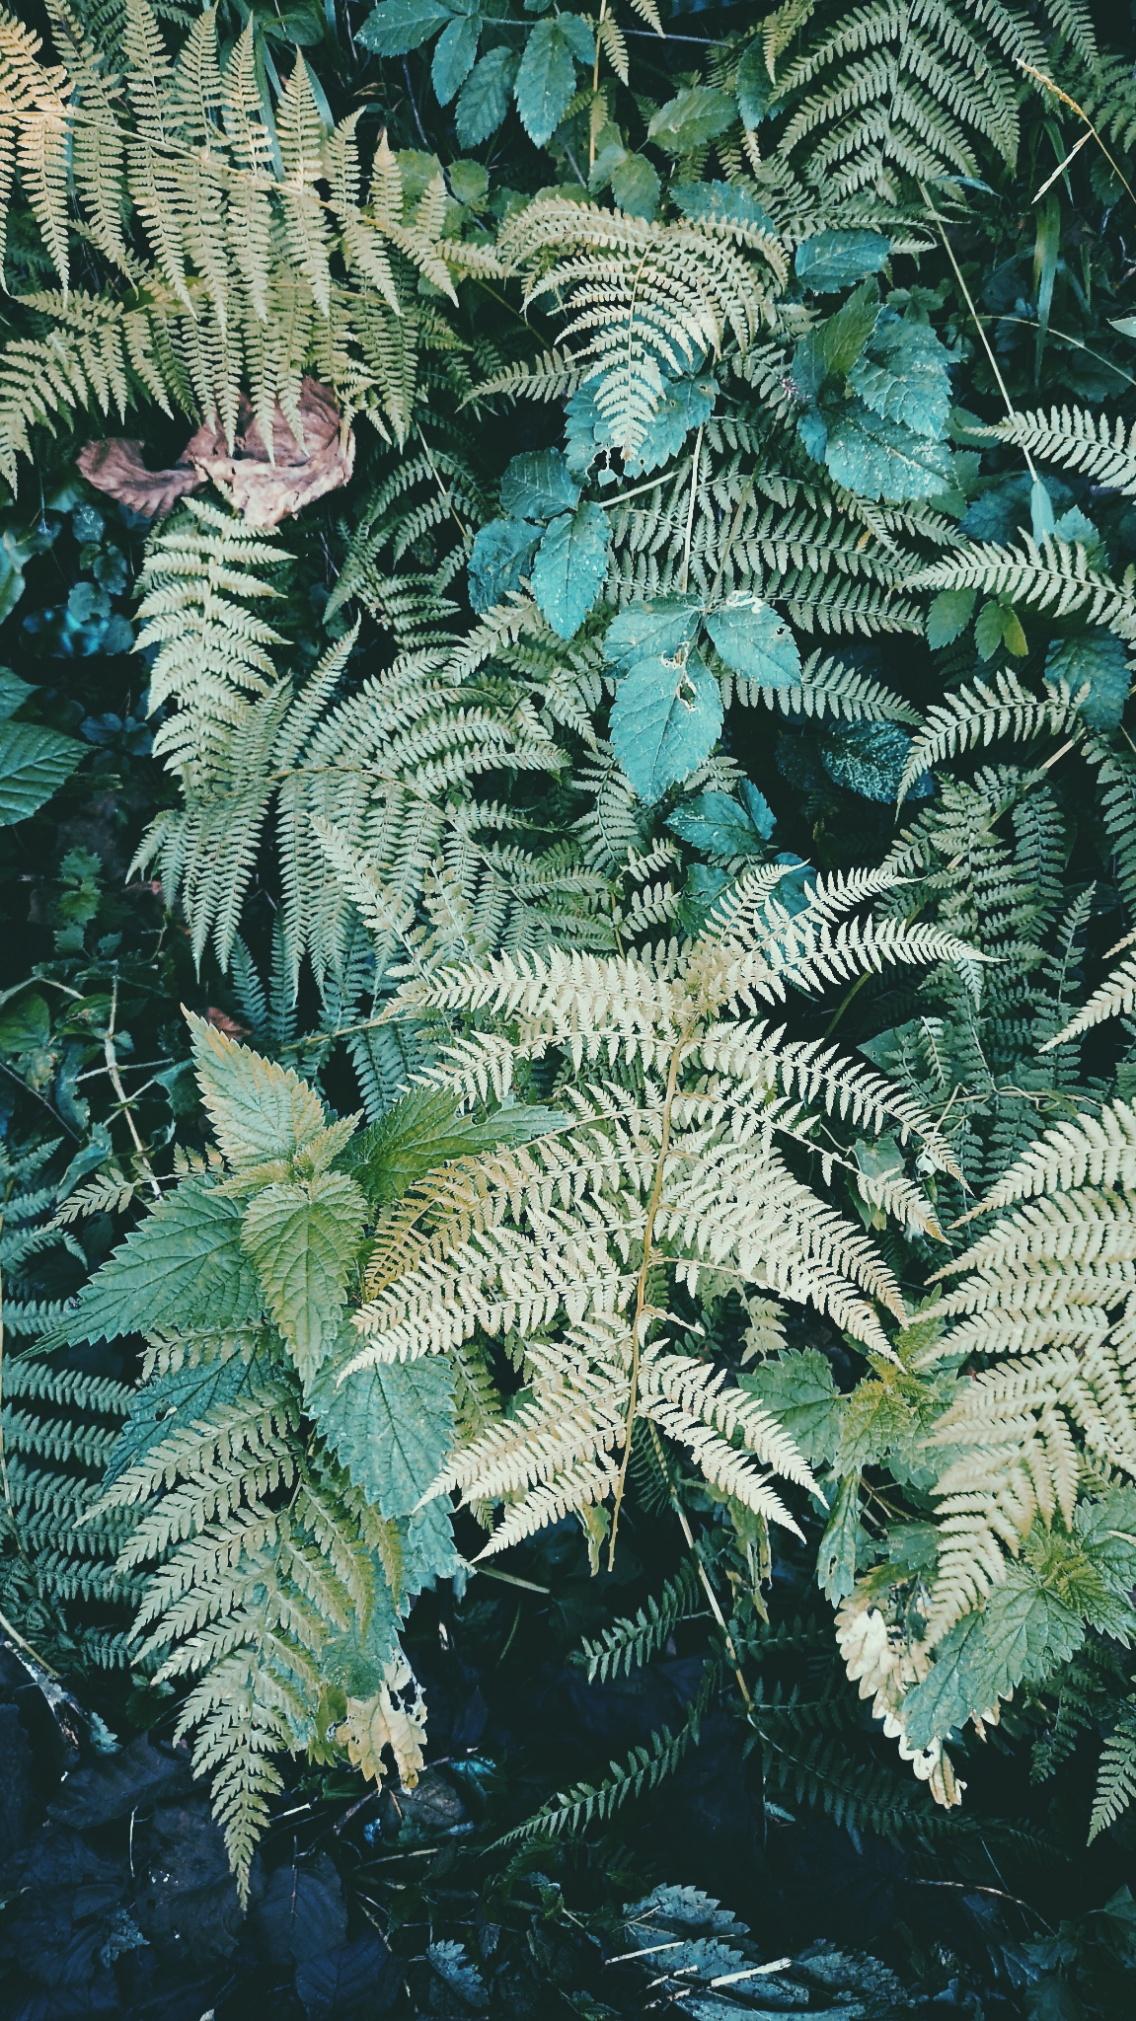 fern nature huaweip20pro p20pro turkey wallpaper vsco 1136x2021